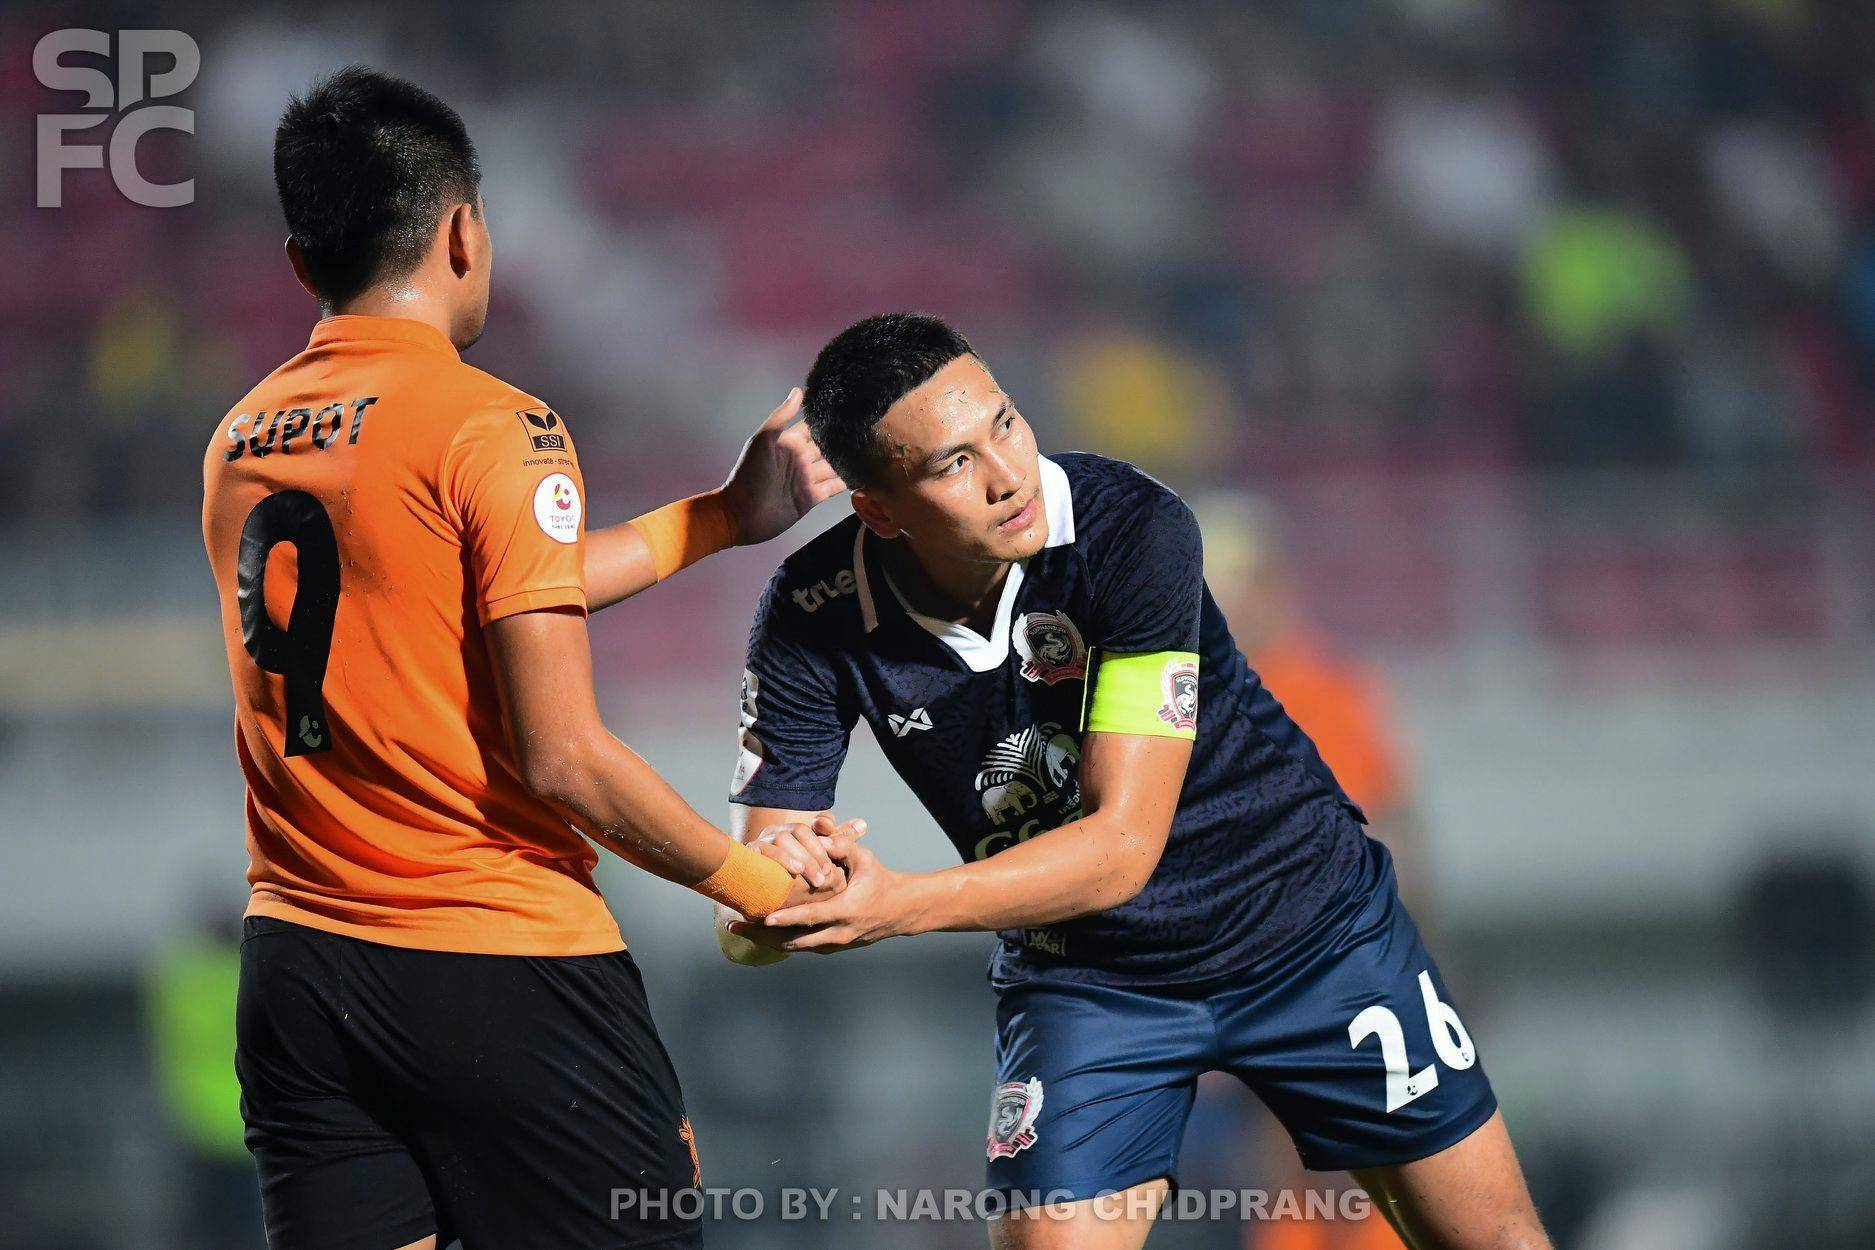 Thai League 2020 – Matchday 3 Best XI